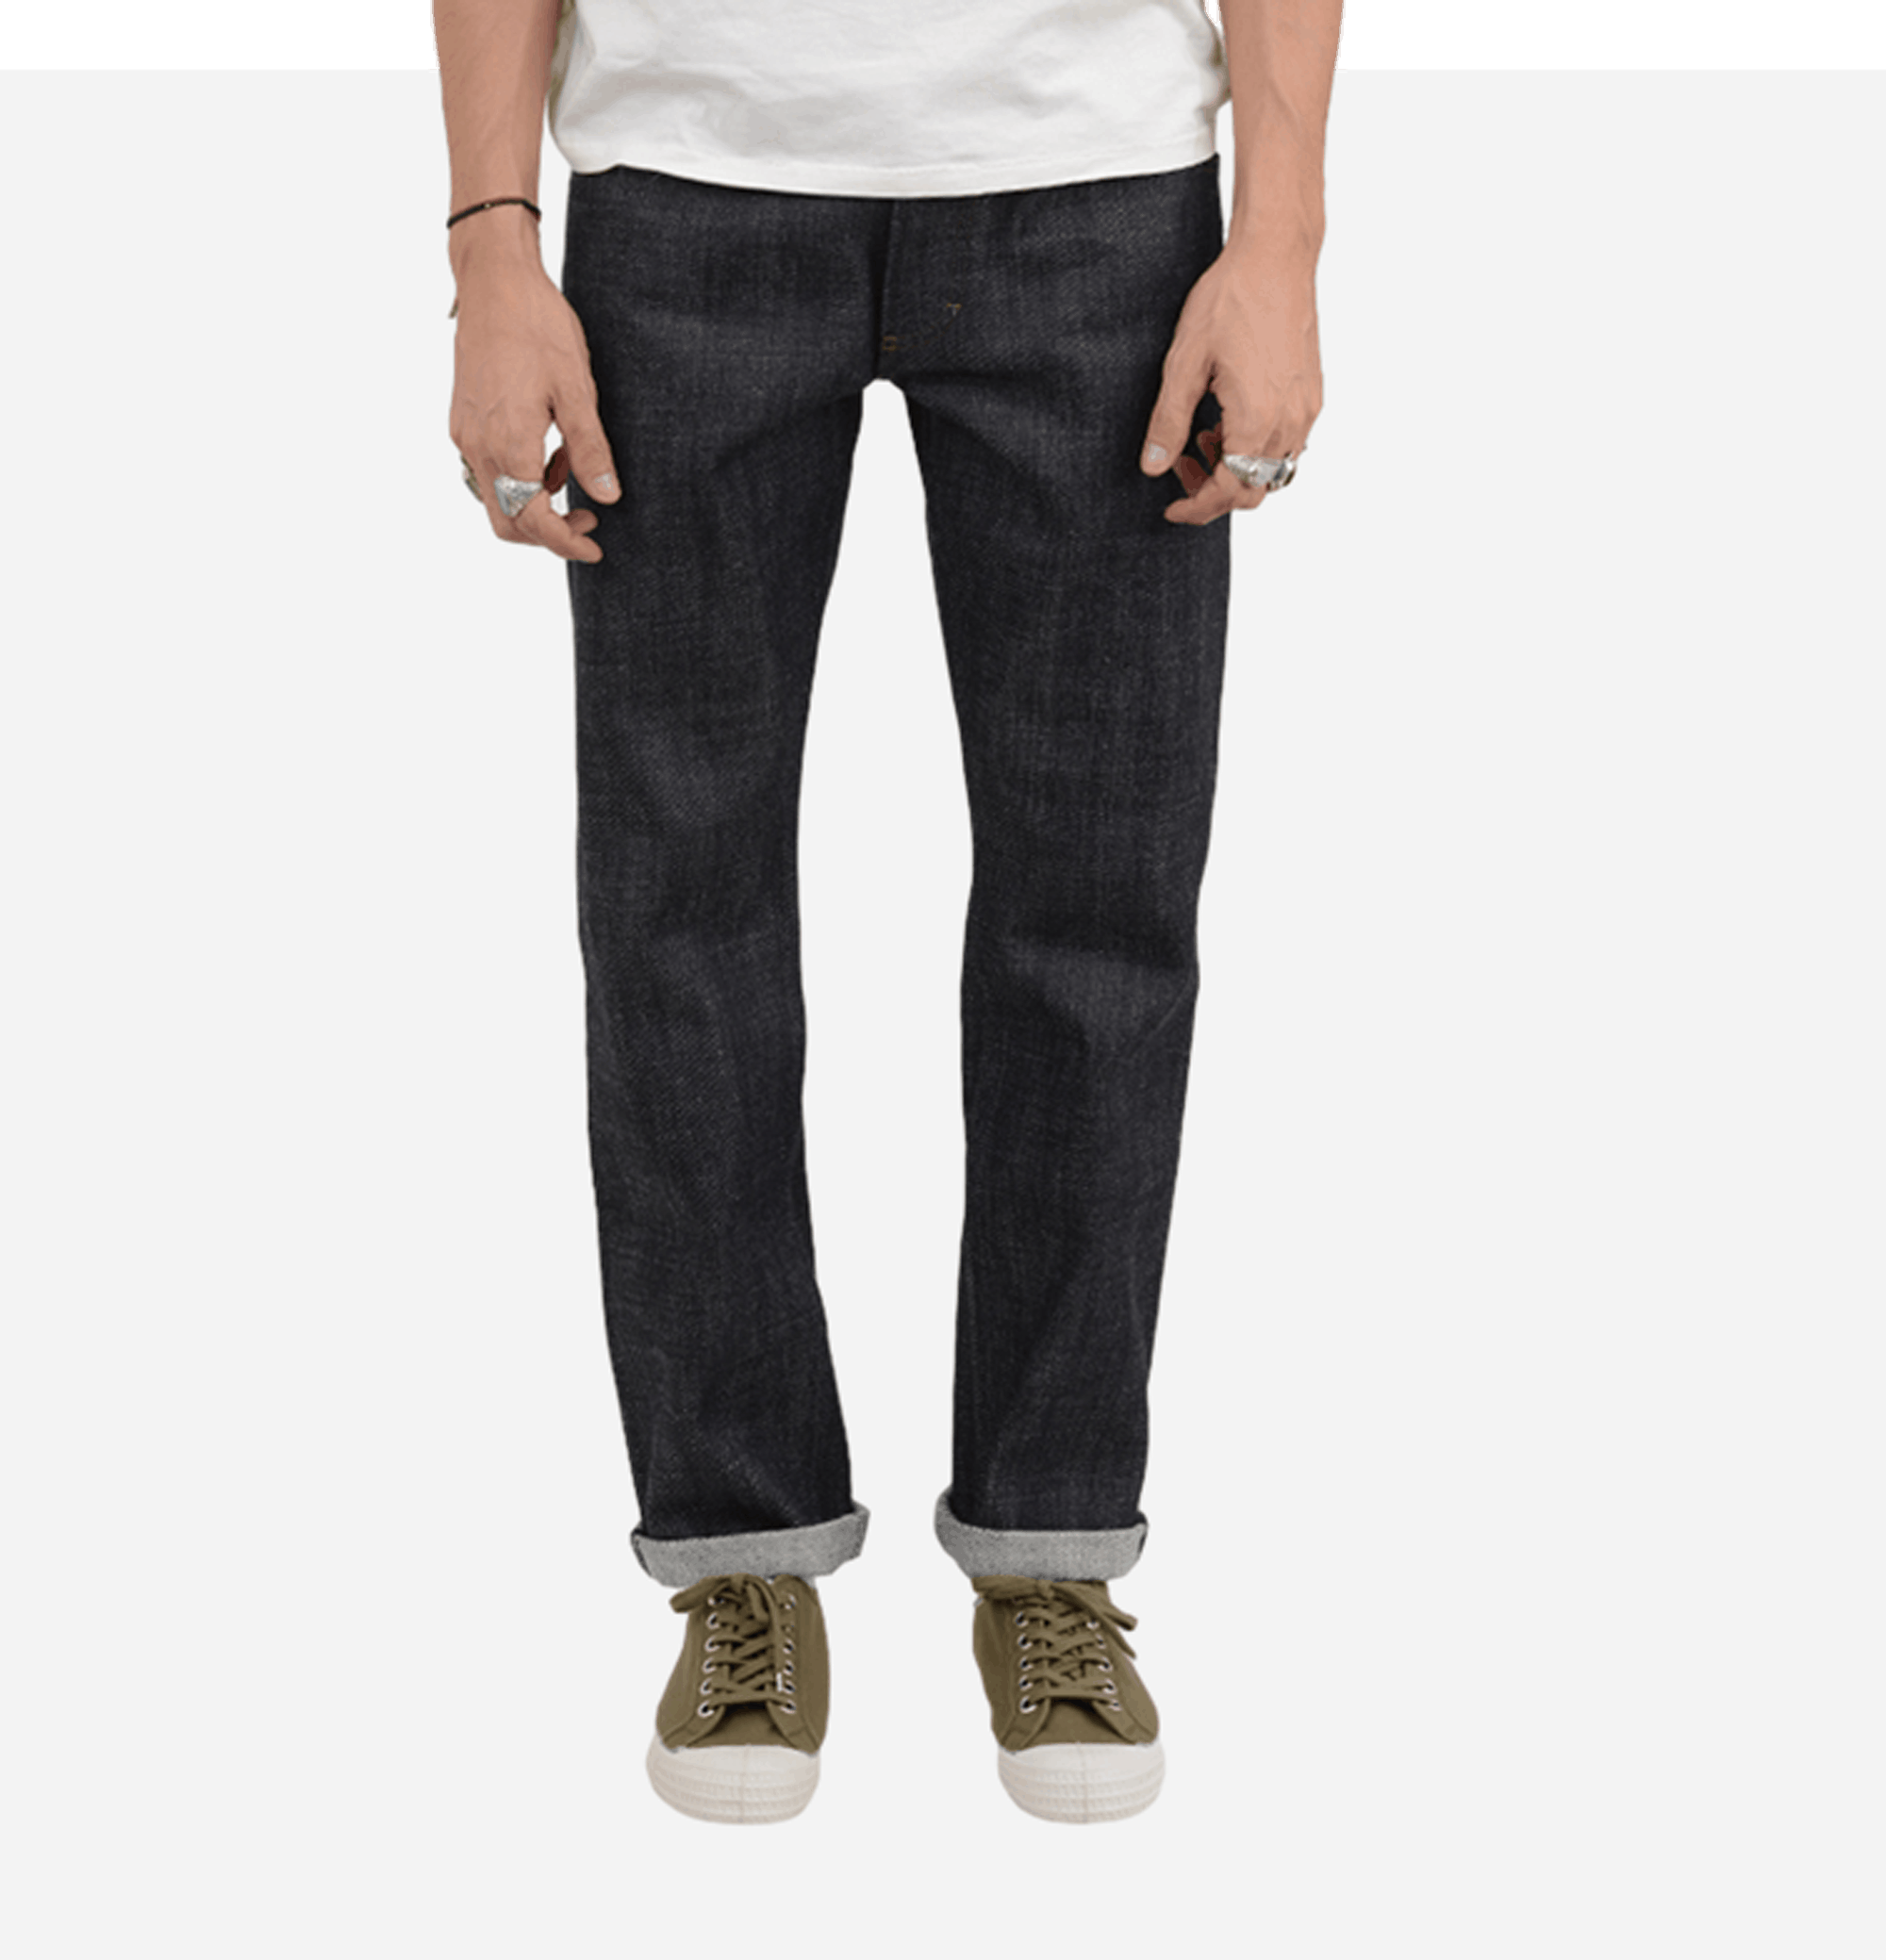 101 Z Jeans 21oz Dry